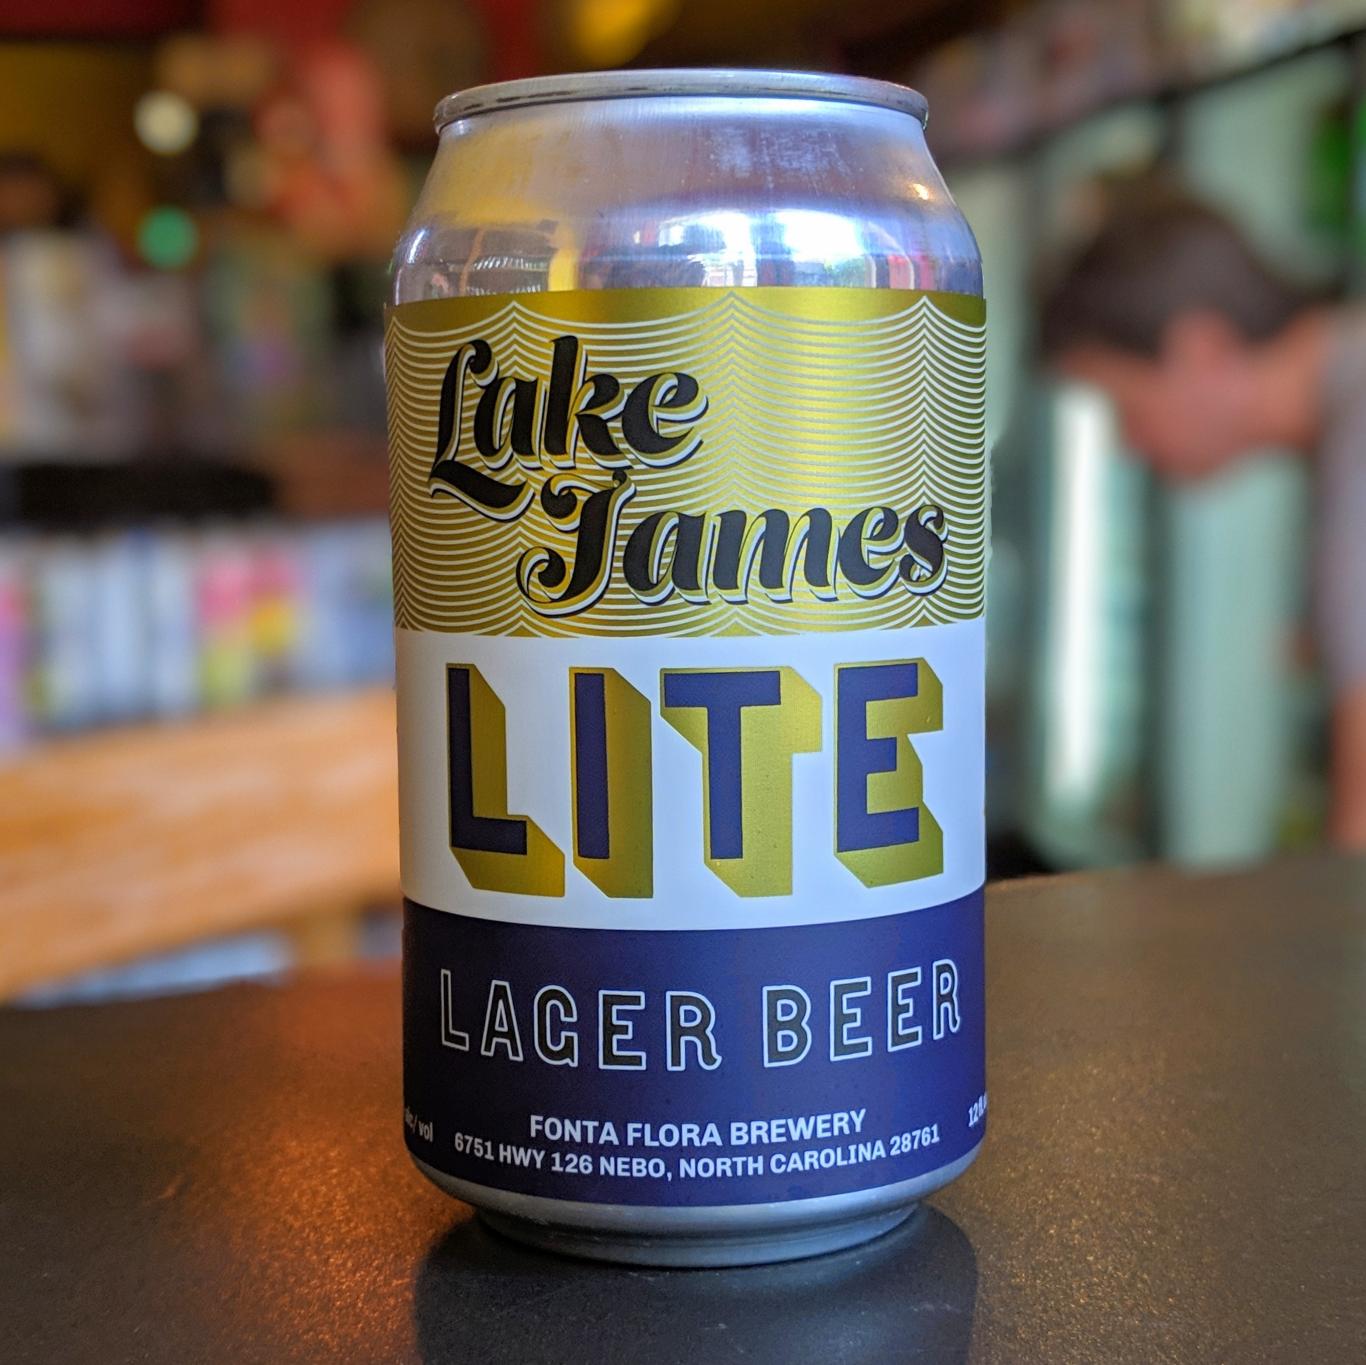 Fonta Flora 'Lake James Lite' Lager Beer 12oz Can